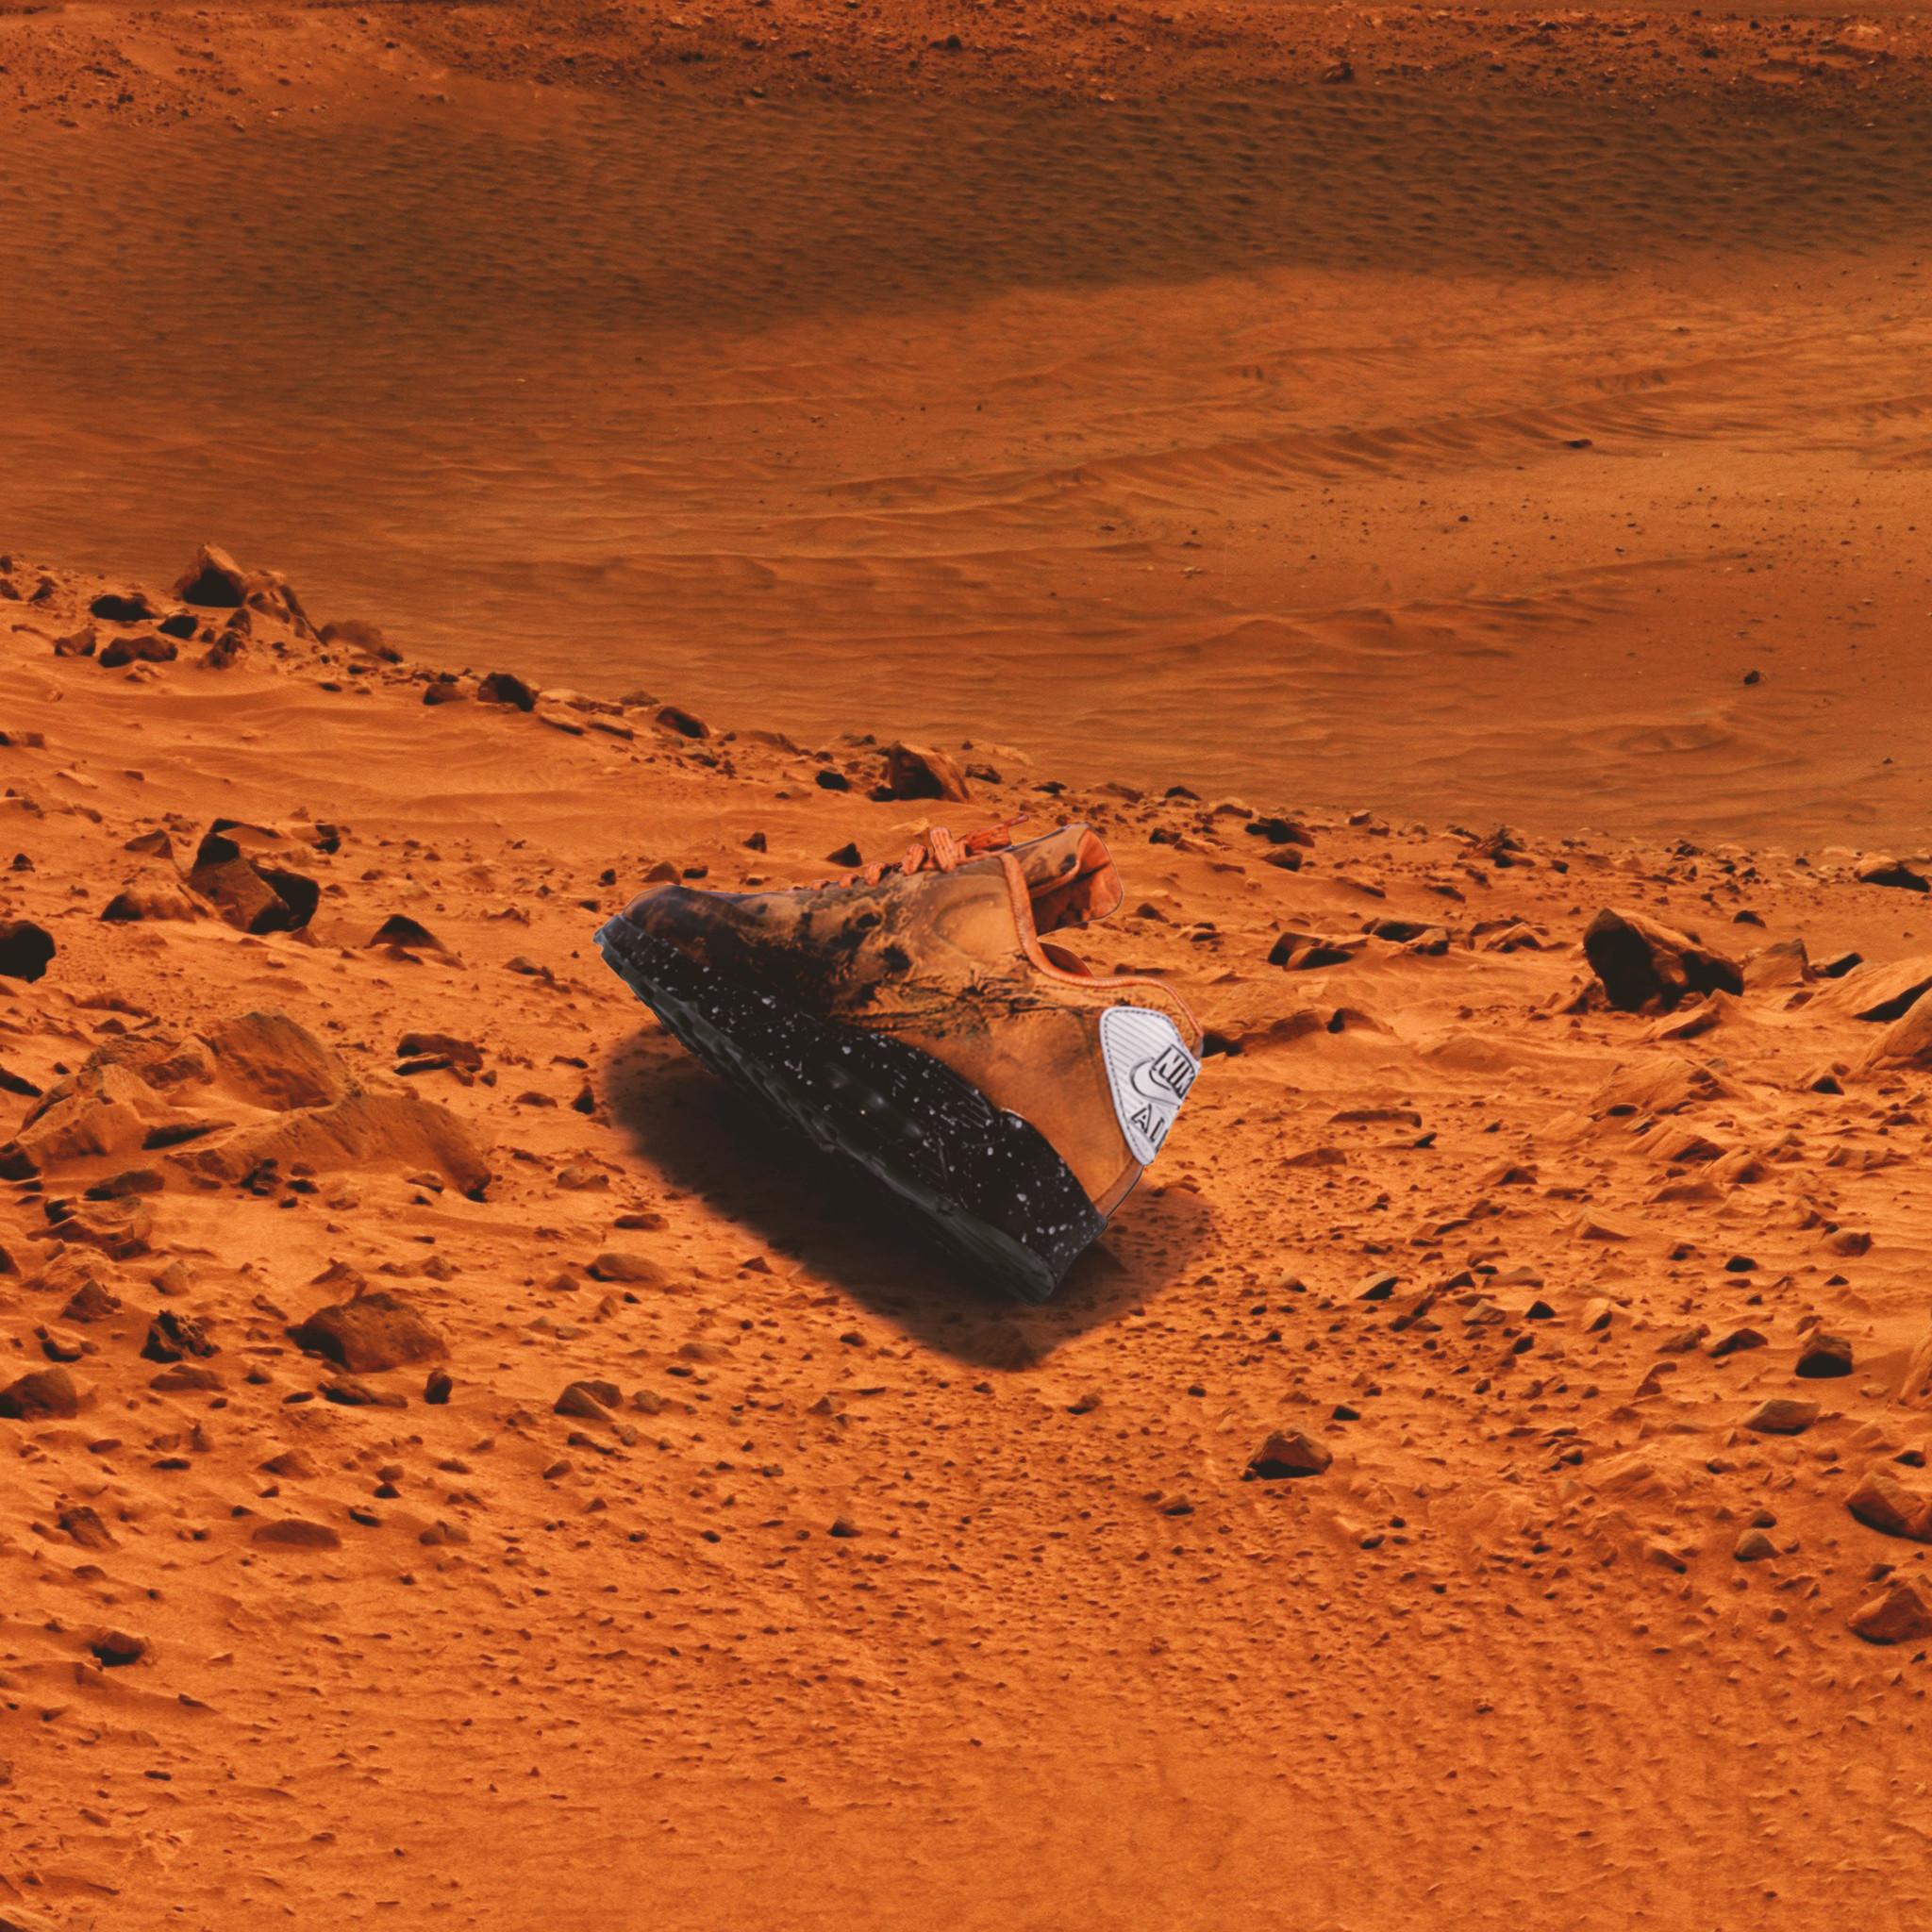 NIKE AIR MAX 90 QS 'MARS LANDING'